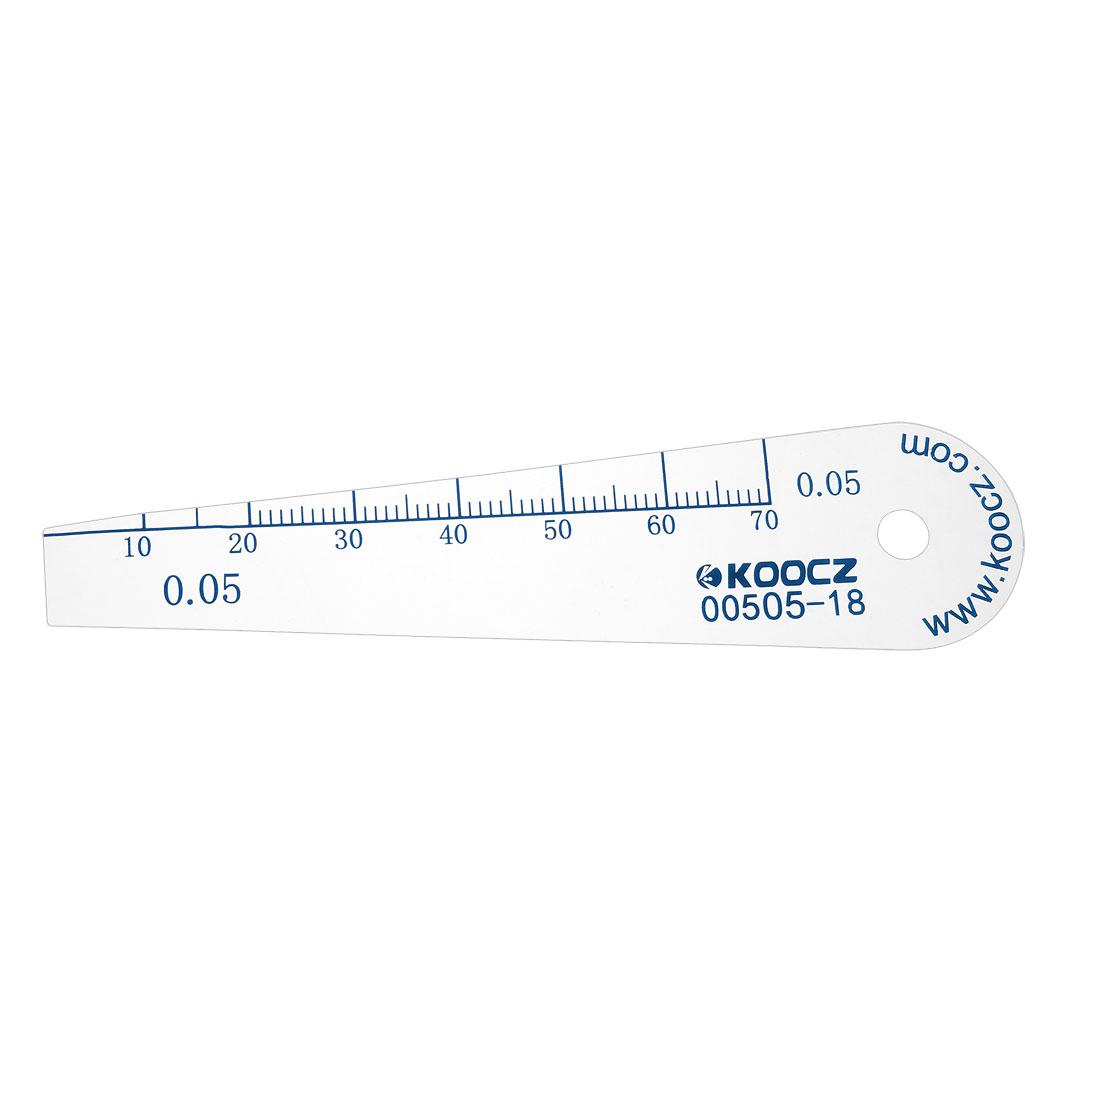 Metric Thickness Feeler Gauge 0.05mm Plastic Measuring Tool for Gap Width